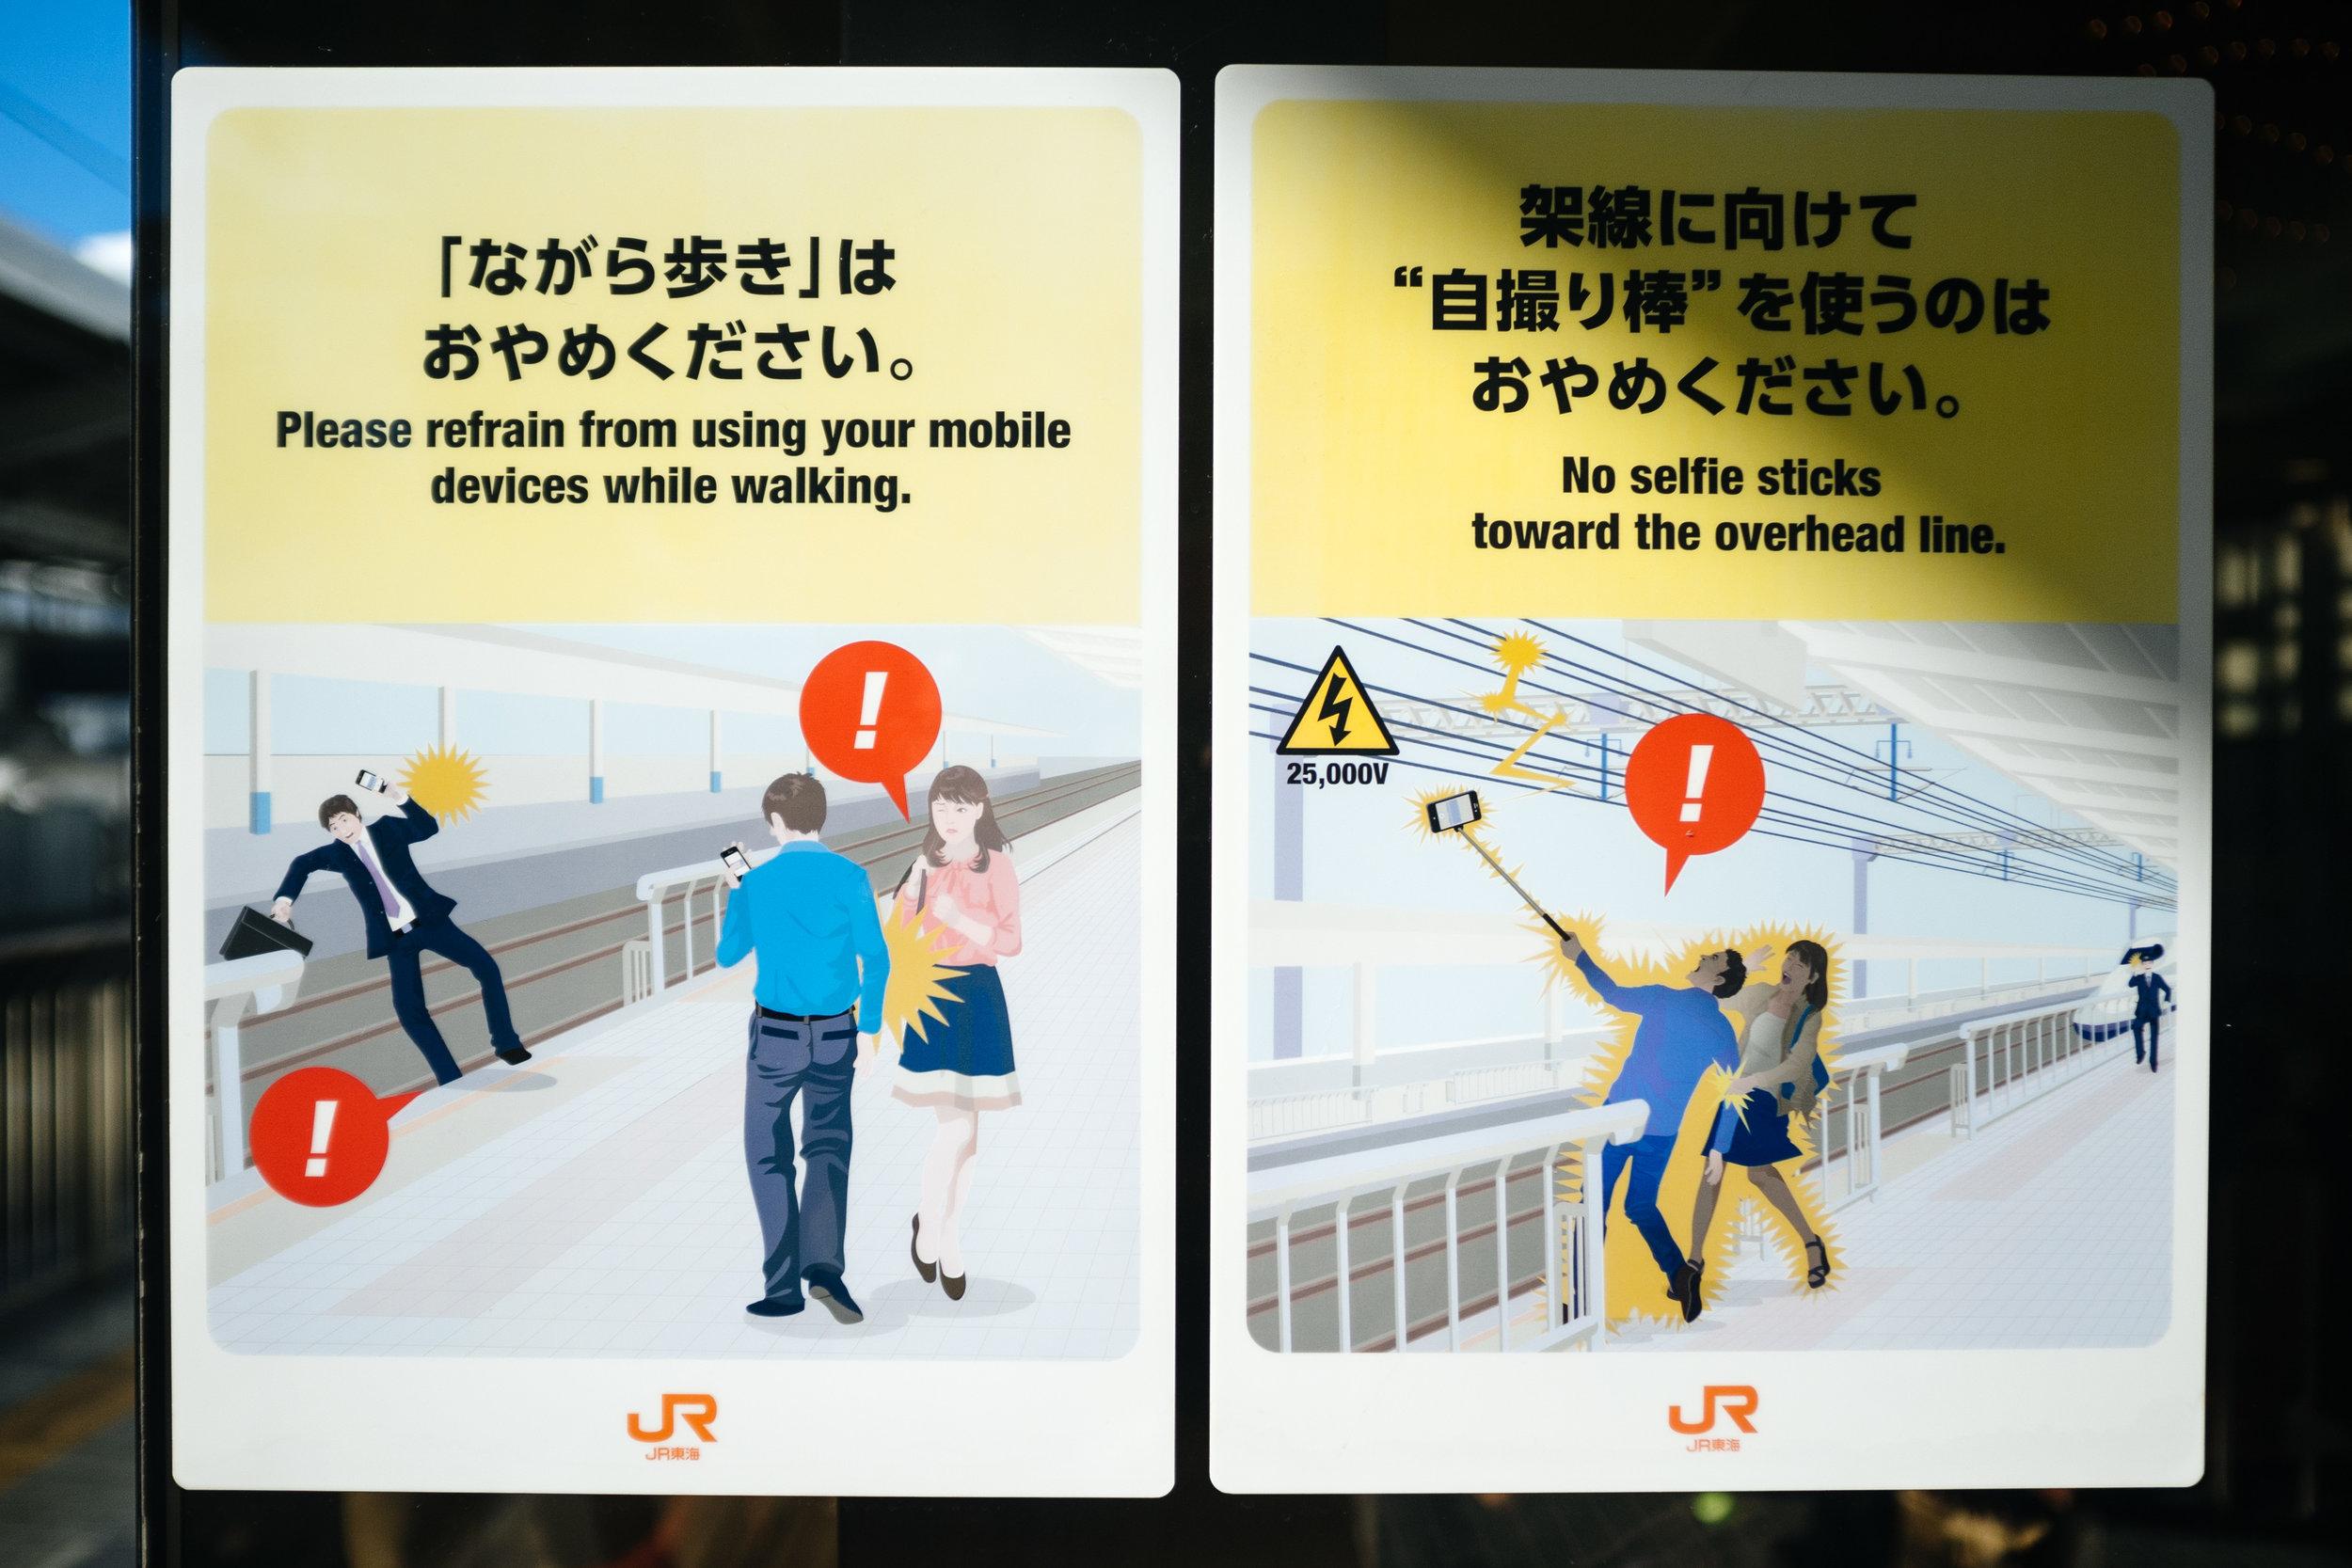 Shinkansen 1.jpg